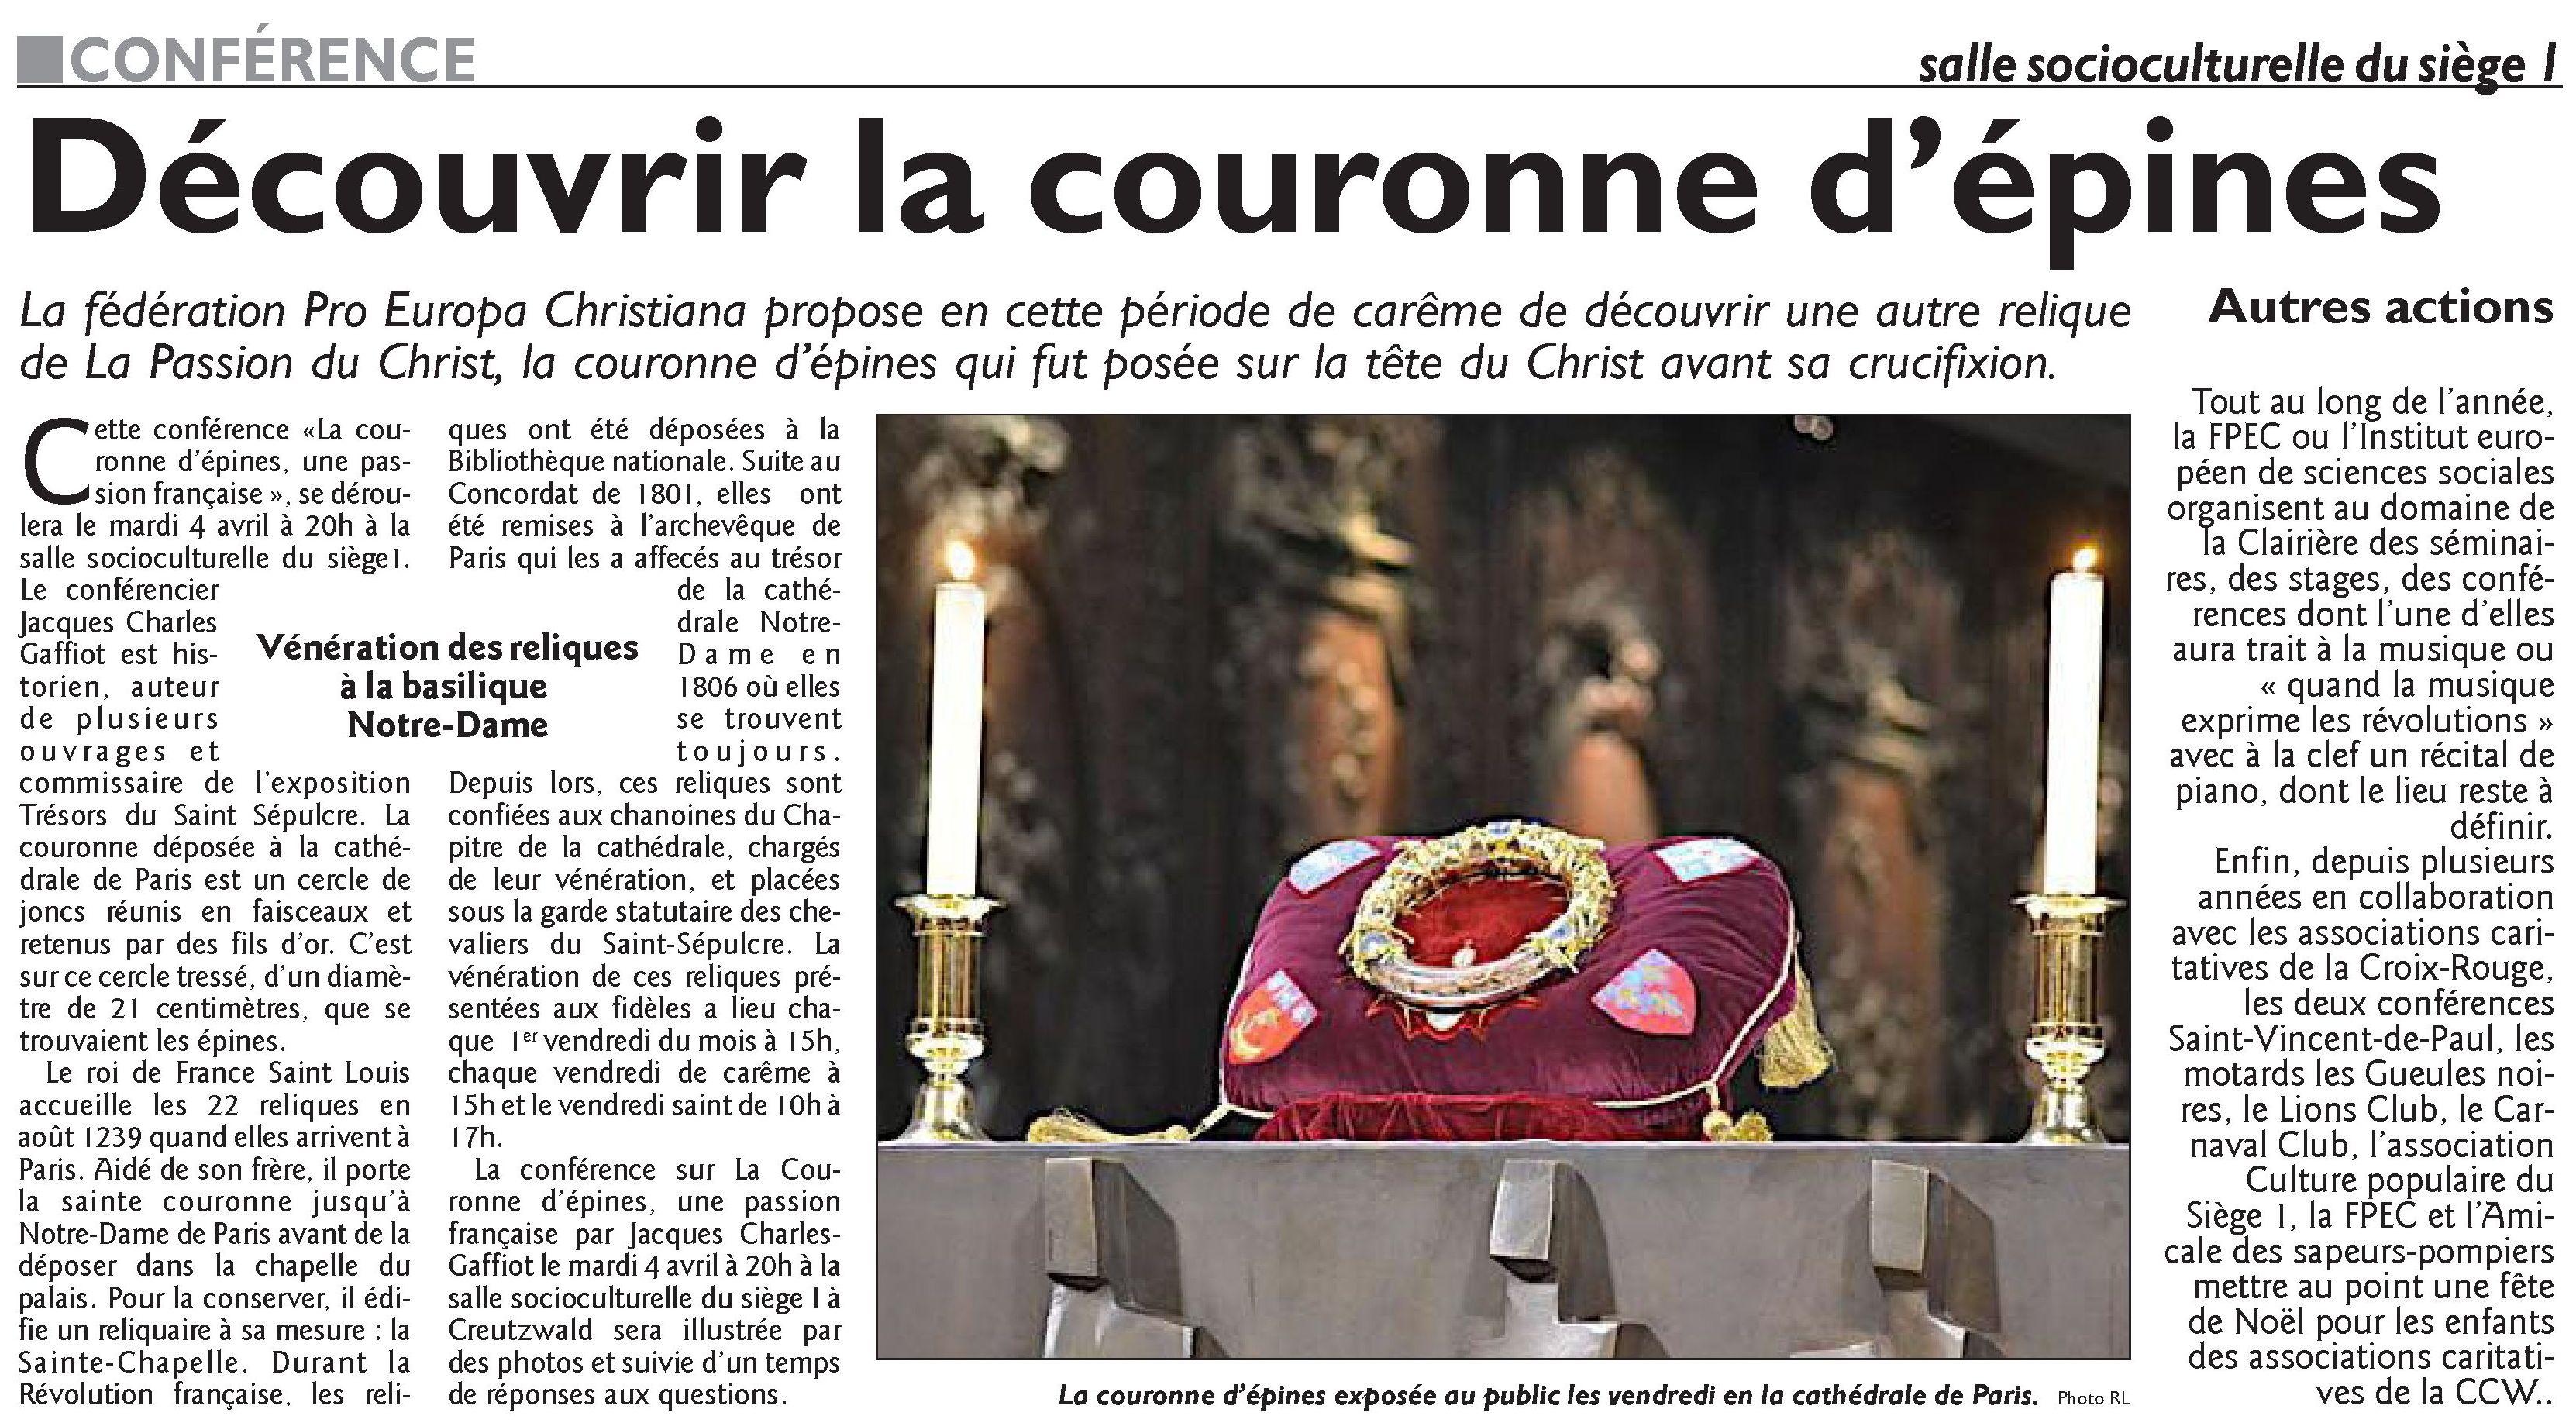 Le Républicain Lorrain, 2 Avril 2017